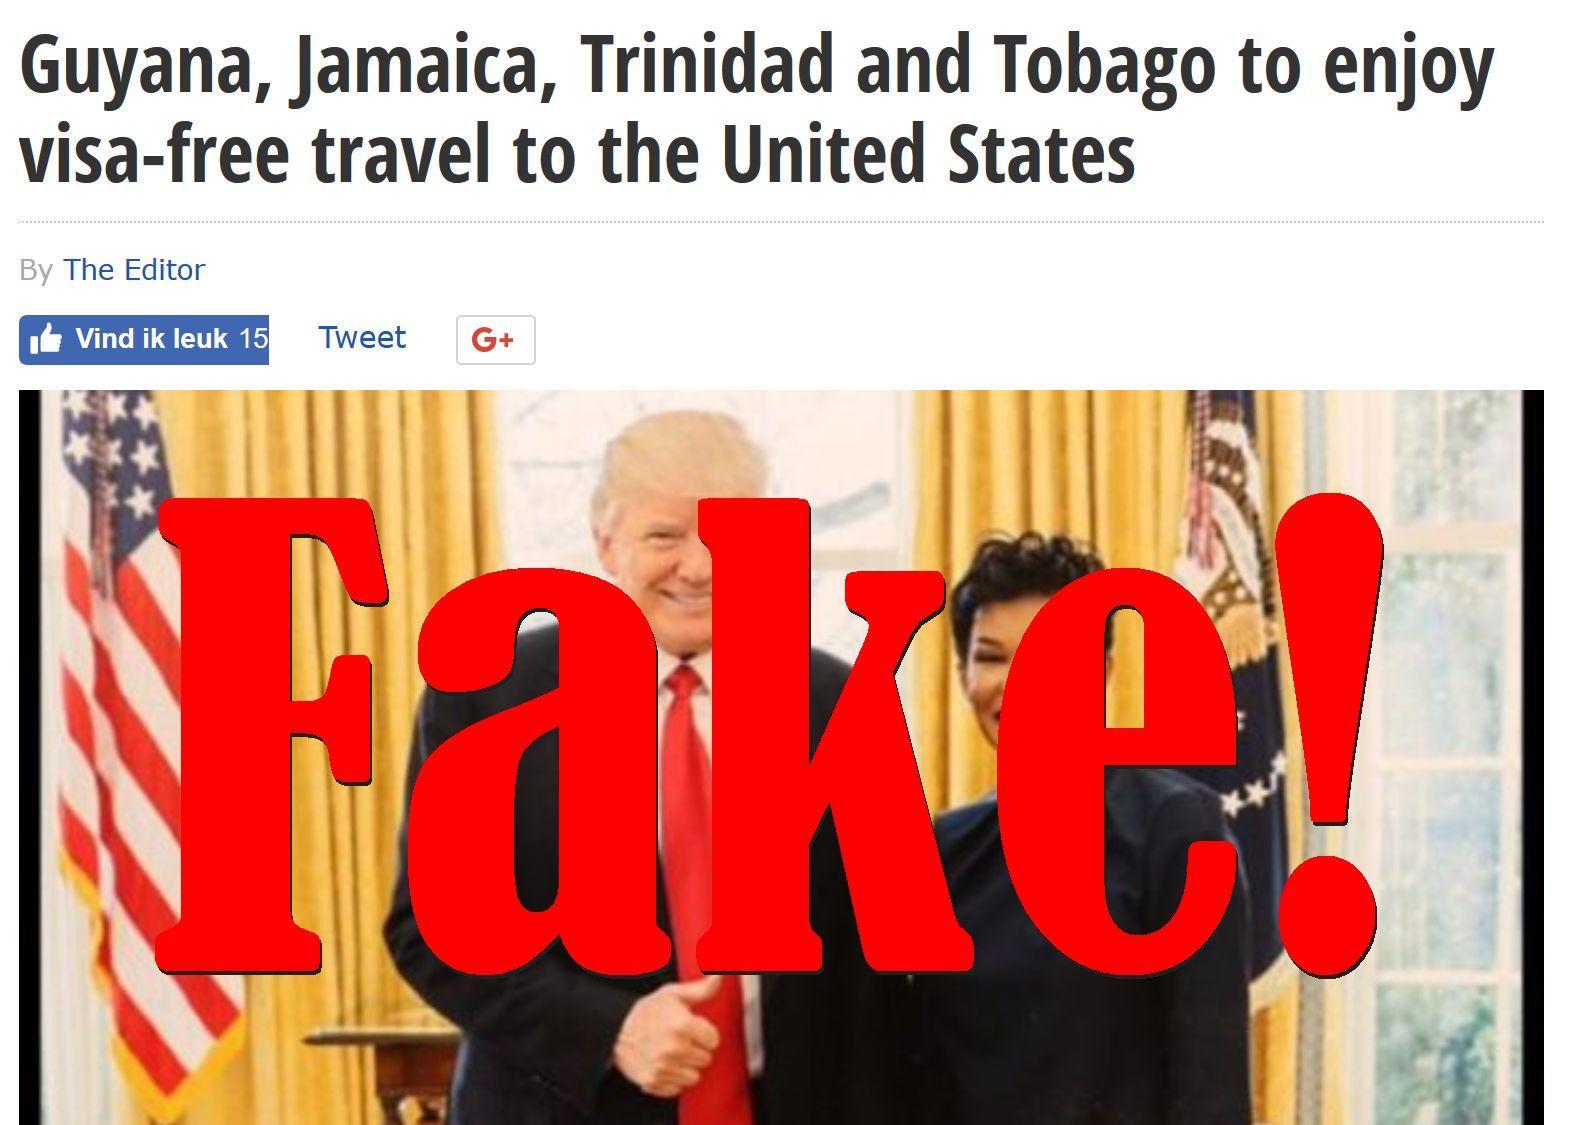 Fake News: Guyana, Jamaica, Trinidad and Tobago NOT To Enjoy Visa-free Travel To The United States